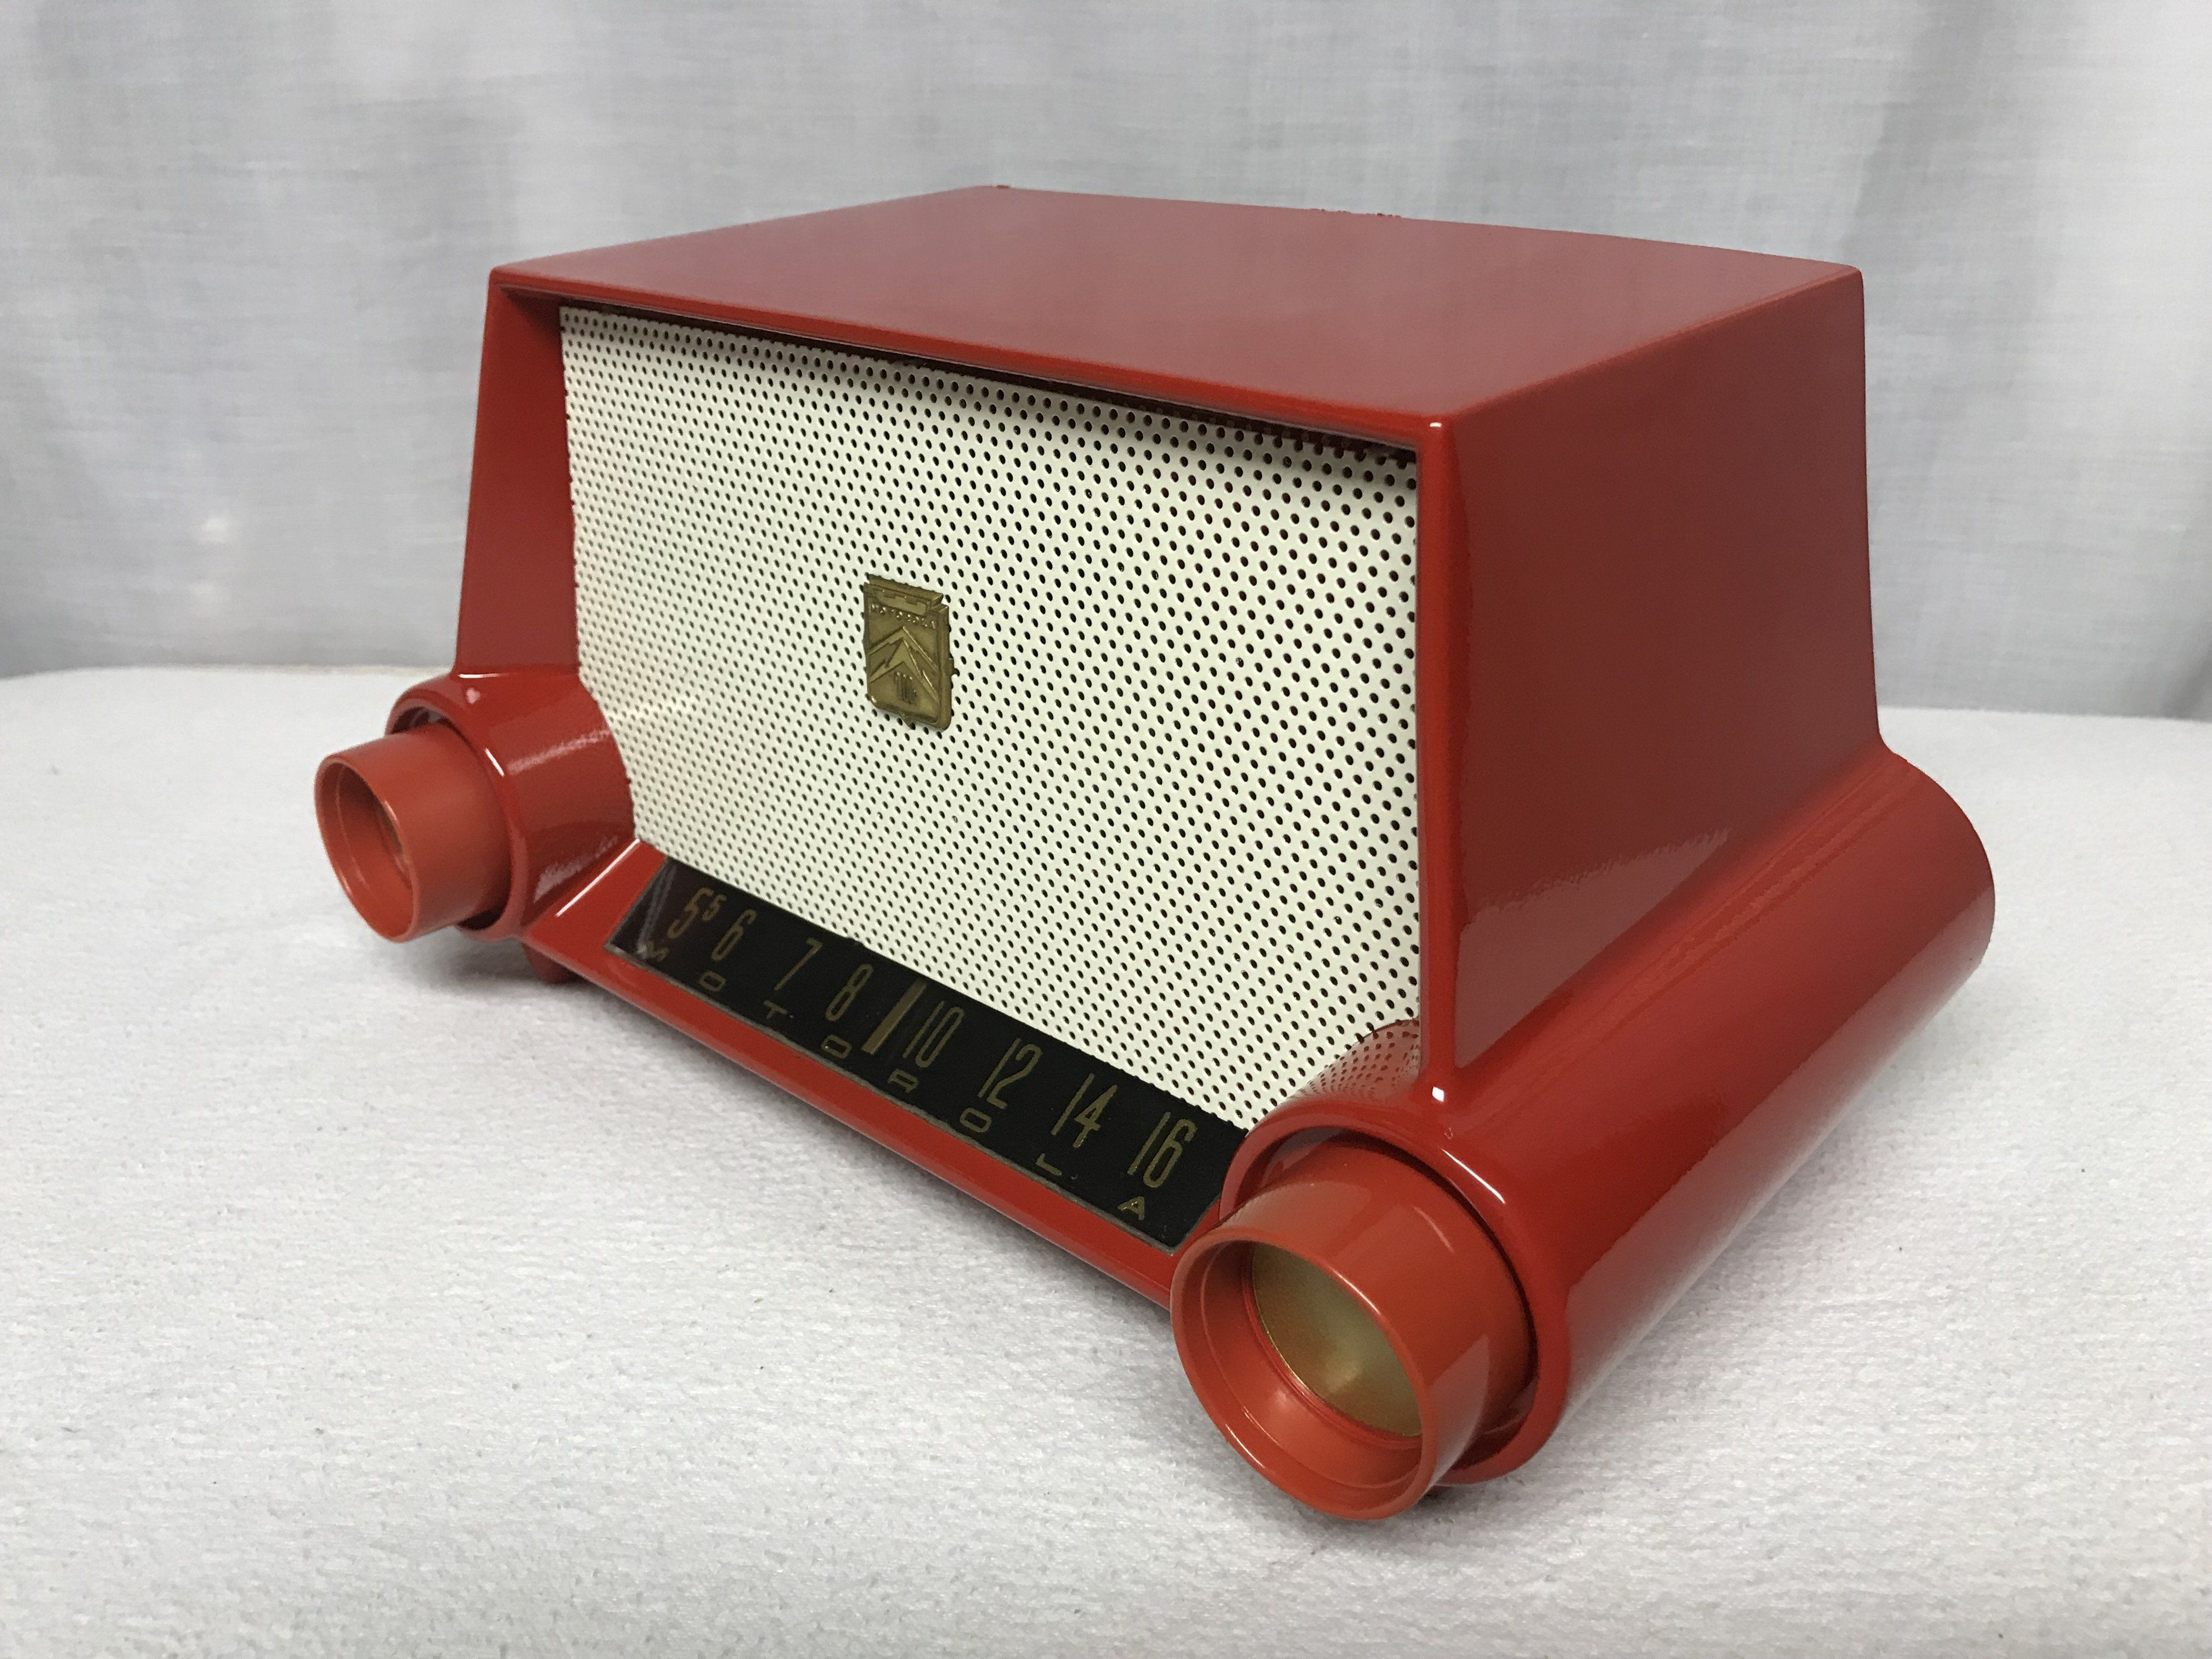 Gorgeous Motorola 53h Restored Tube Radio In 2020 Retro Radios